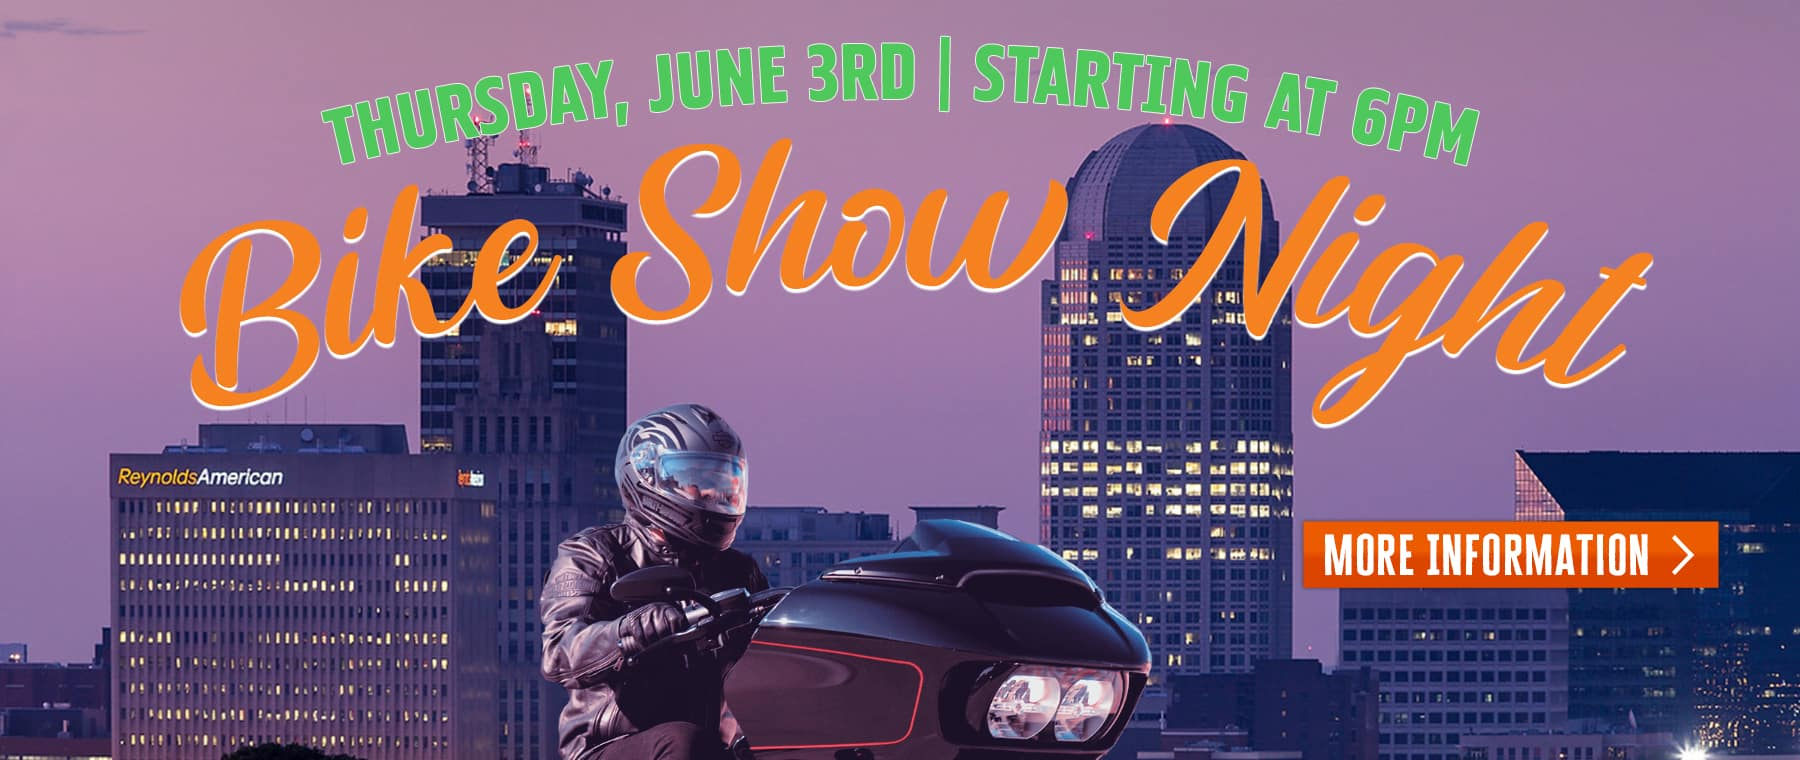 Bike Show Night – Web Banner 3